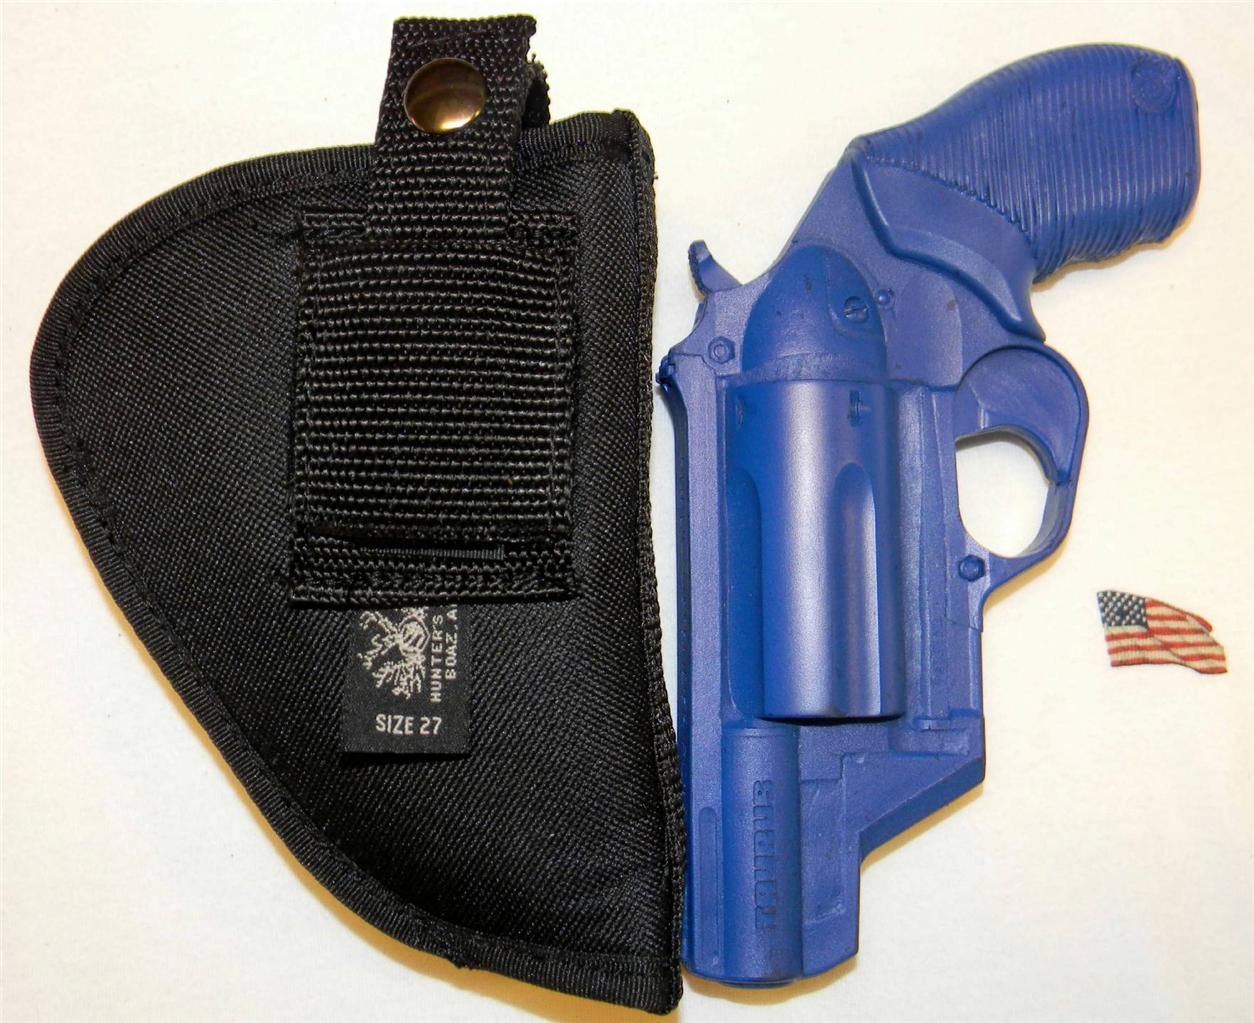 TAURUS THE JUDGE PUBLIC DEFENDER POLY TACTICAL NYLON BELT ... - photo#32